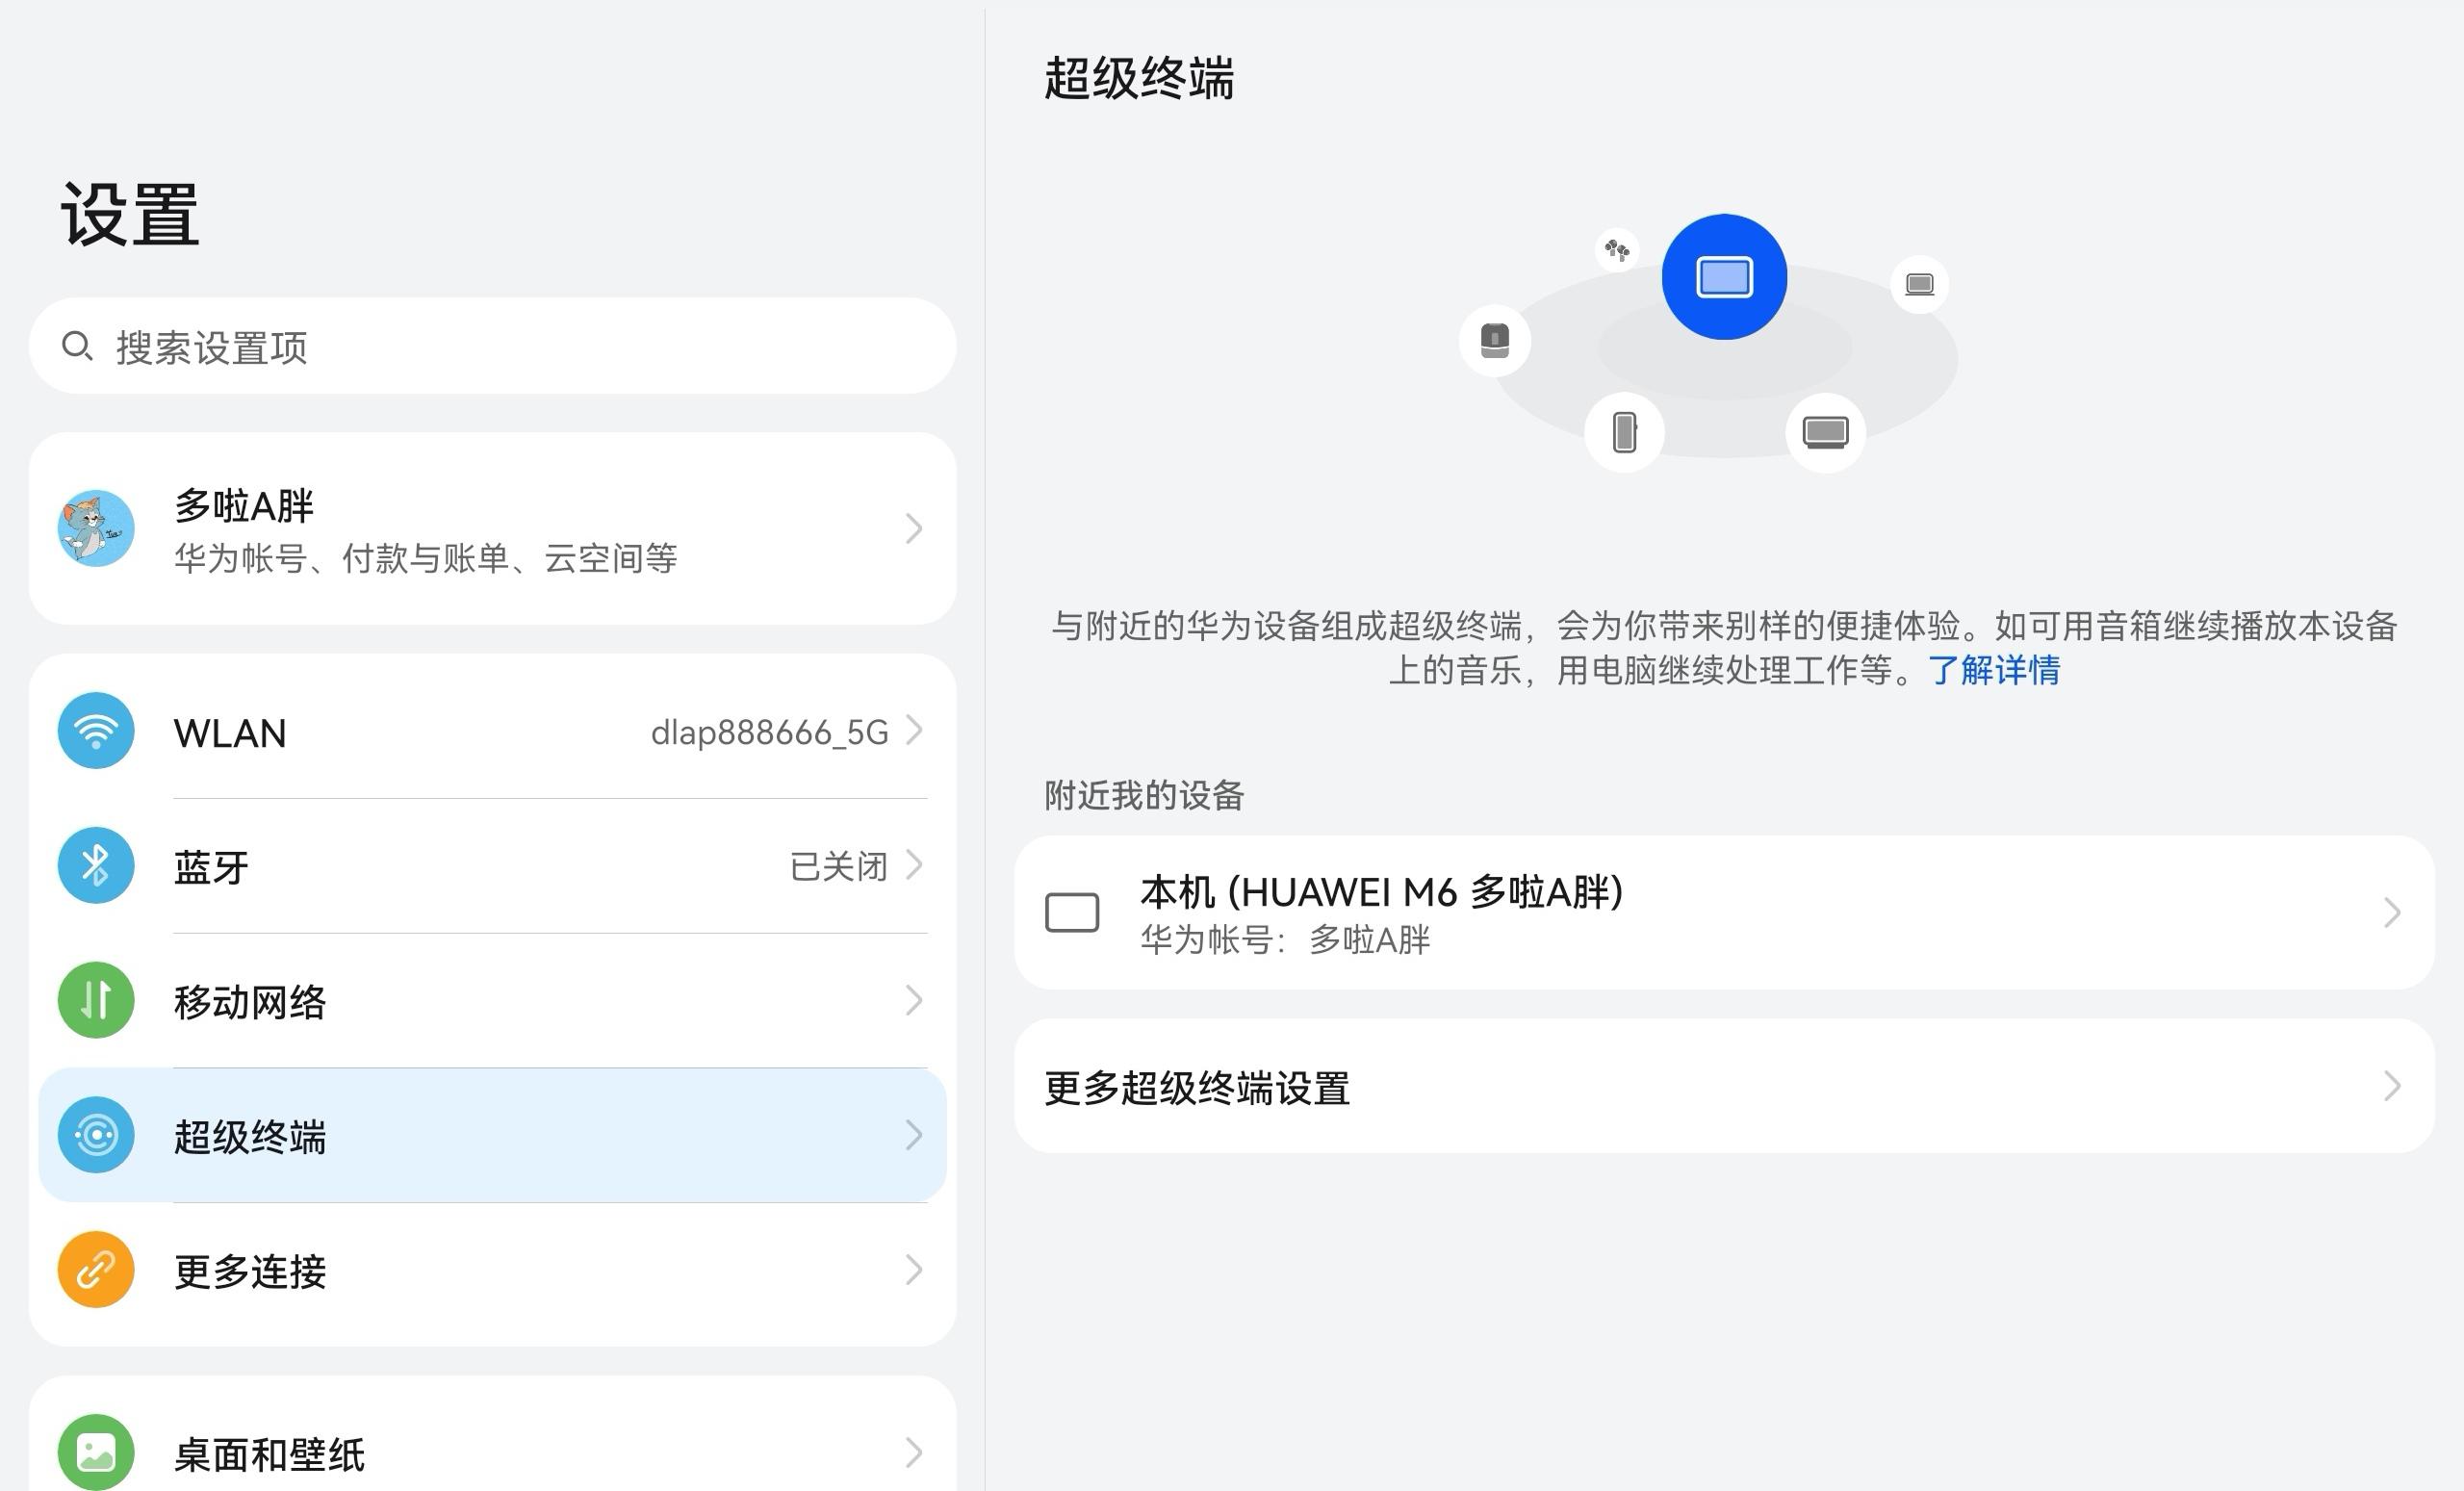 Screenshot_20210623_181447_com.huawei.controlcenter_edit_126247167317190.jpg